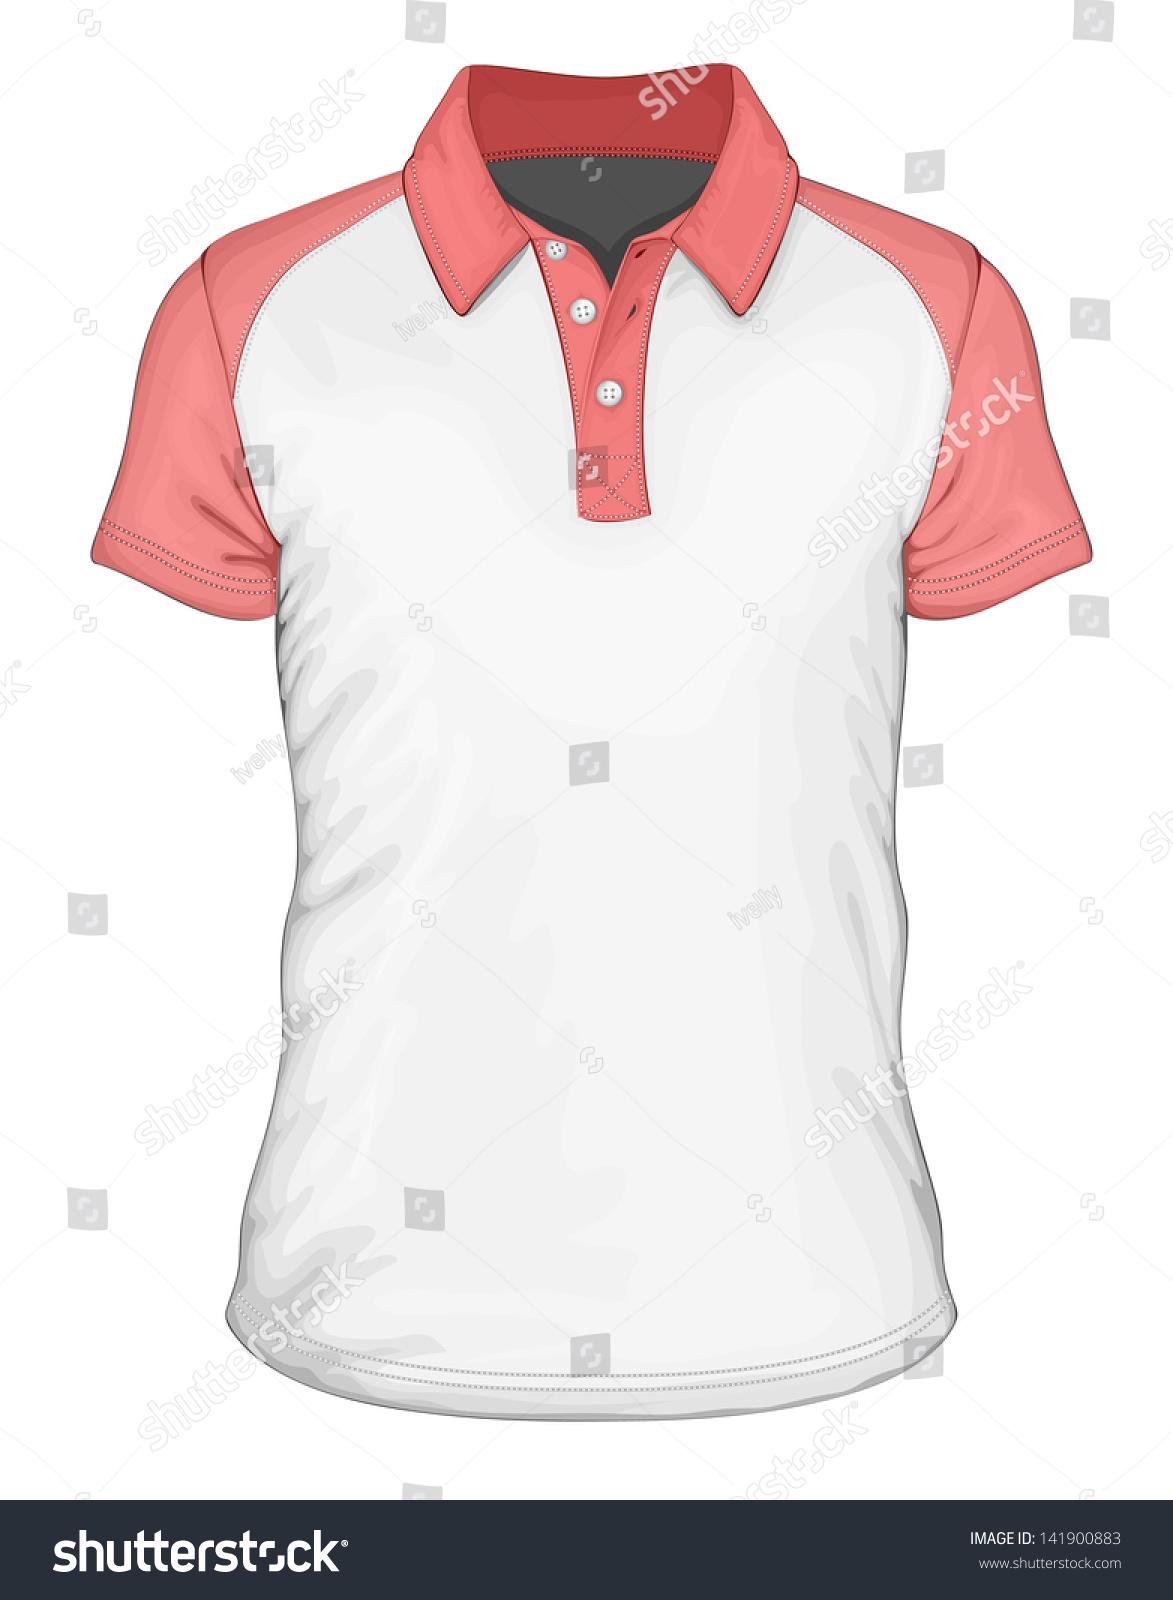 Shirt design illustrator template - Men S Short Sleeve Polo Shirt Design Templates Front View Vector Illustration